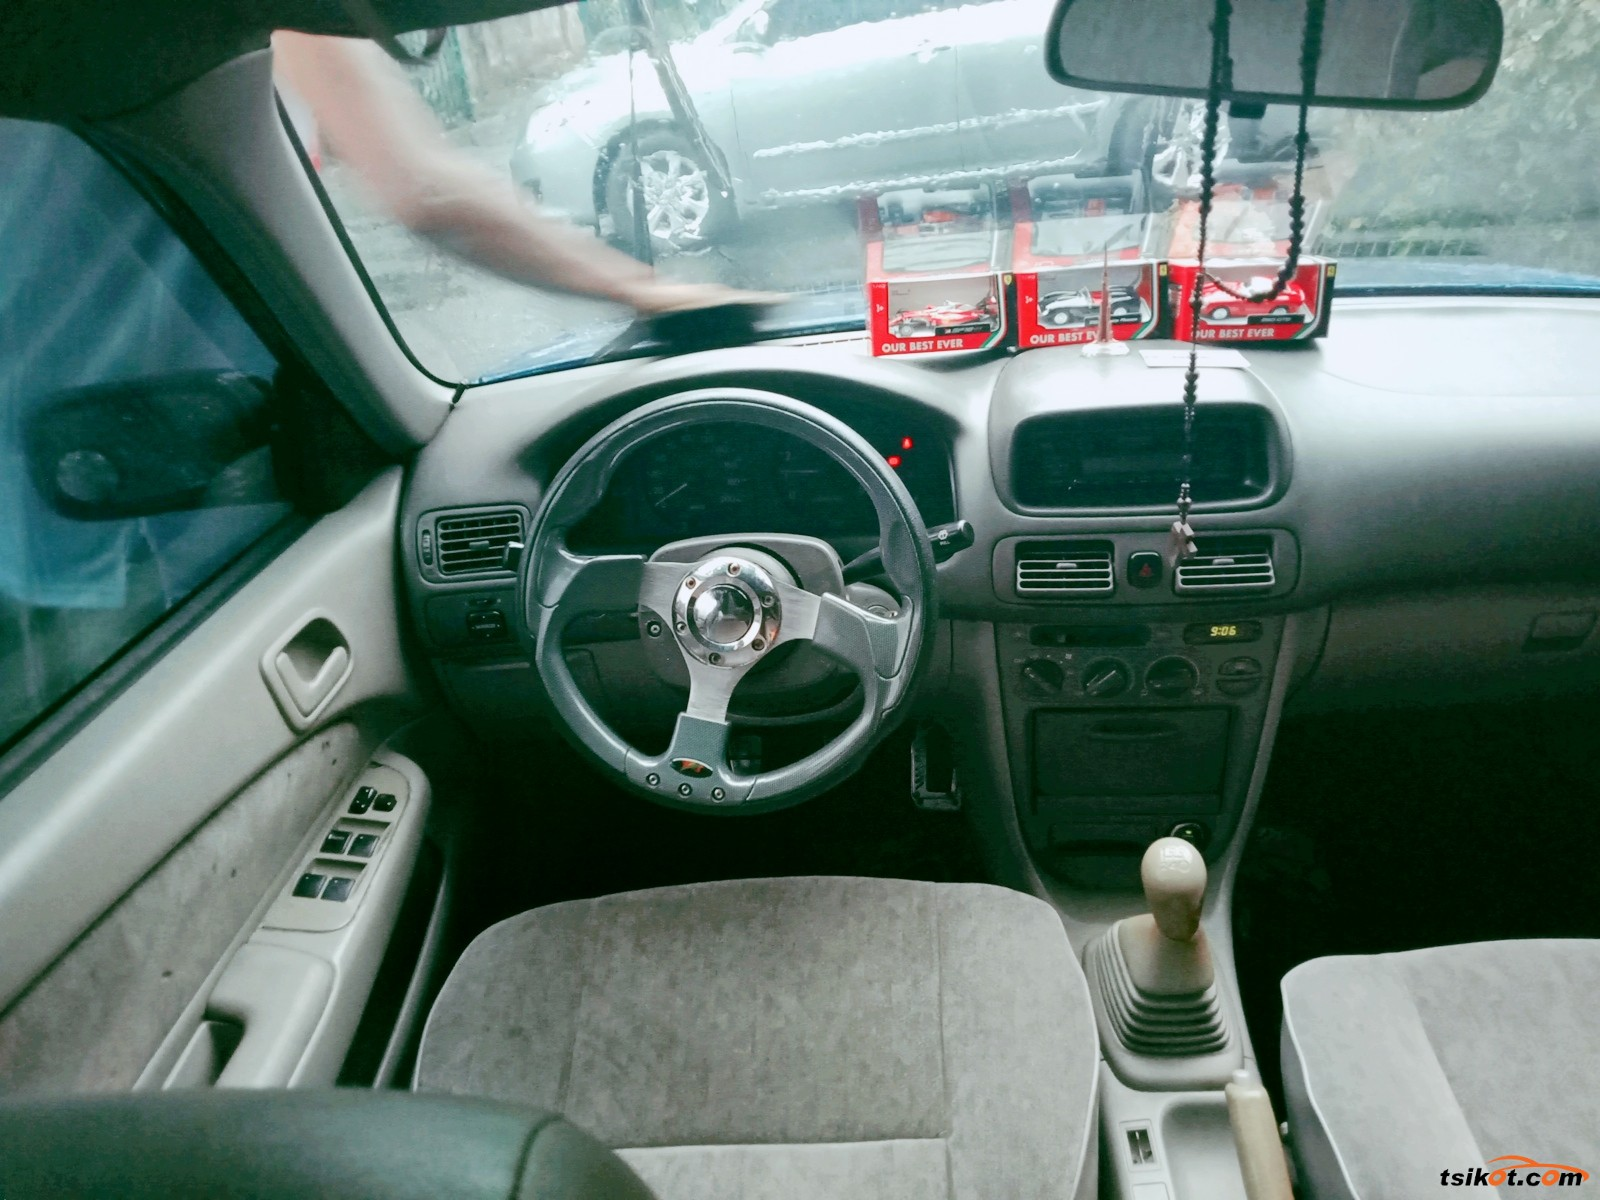 Toyota Corolla 2001 - 5